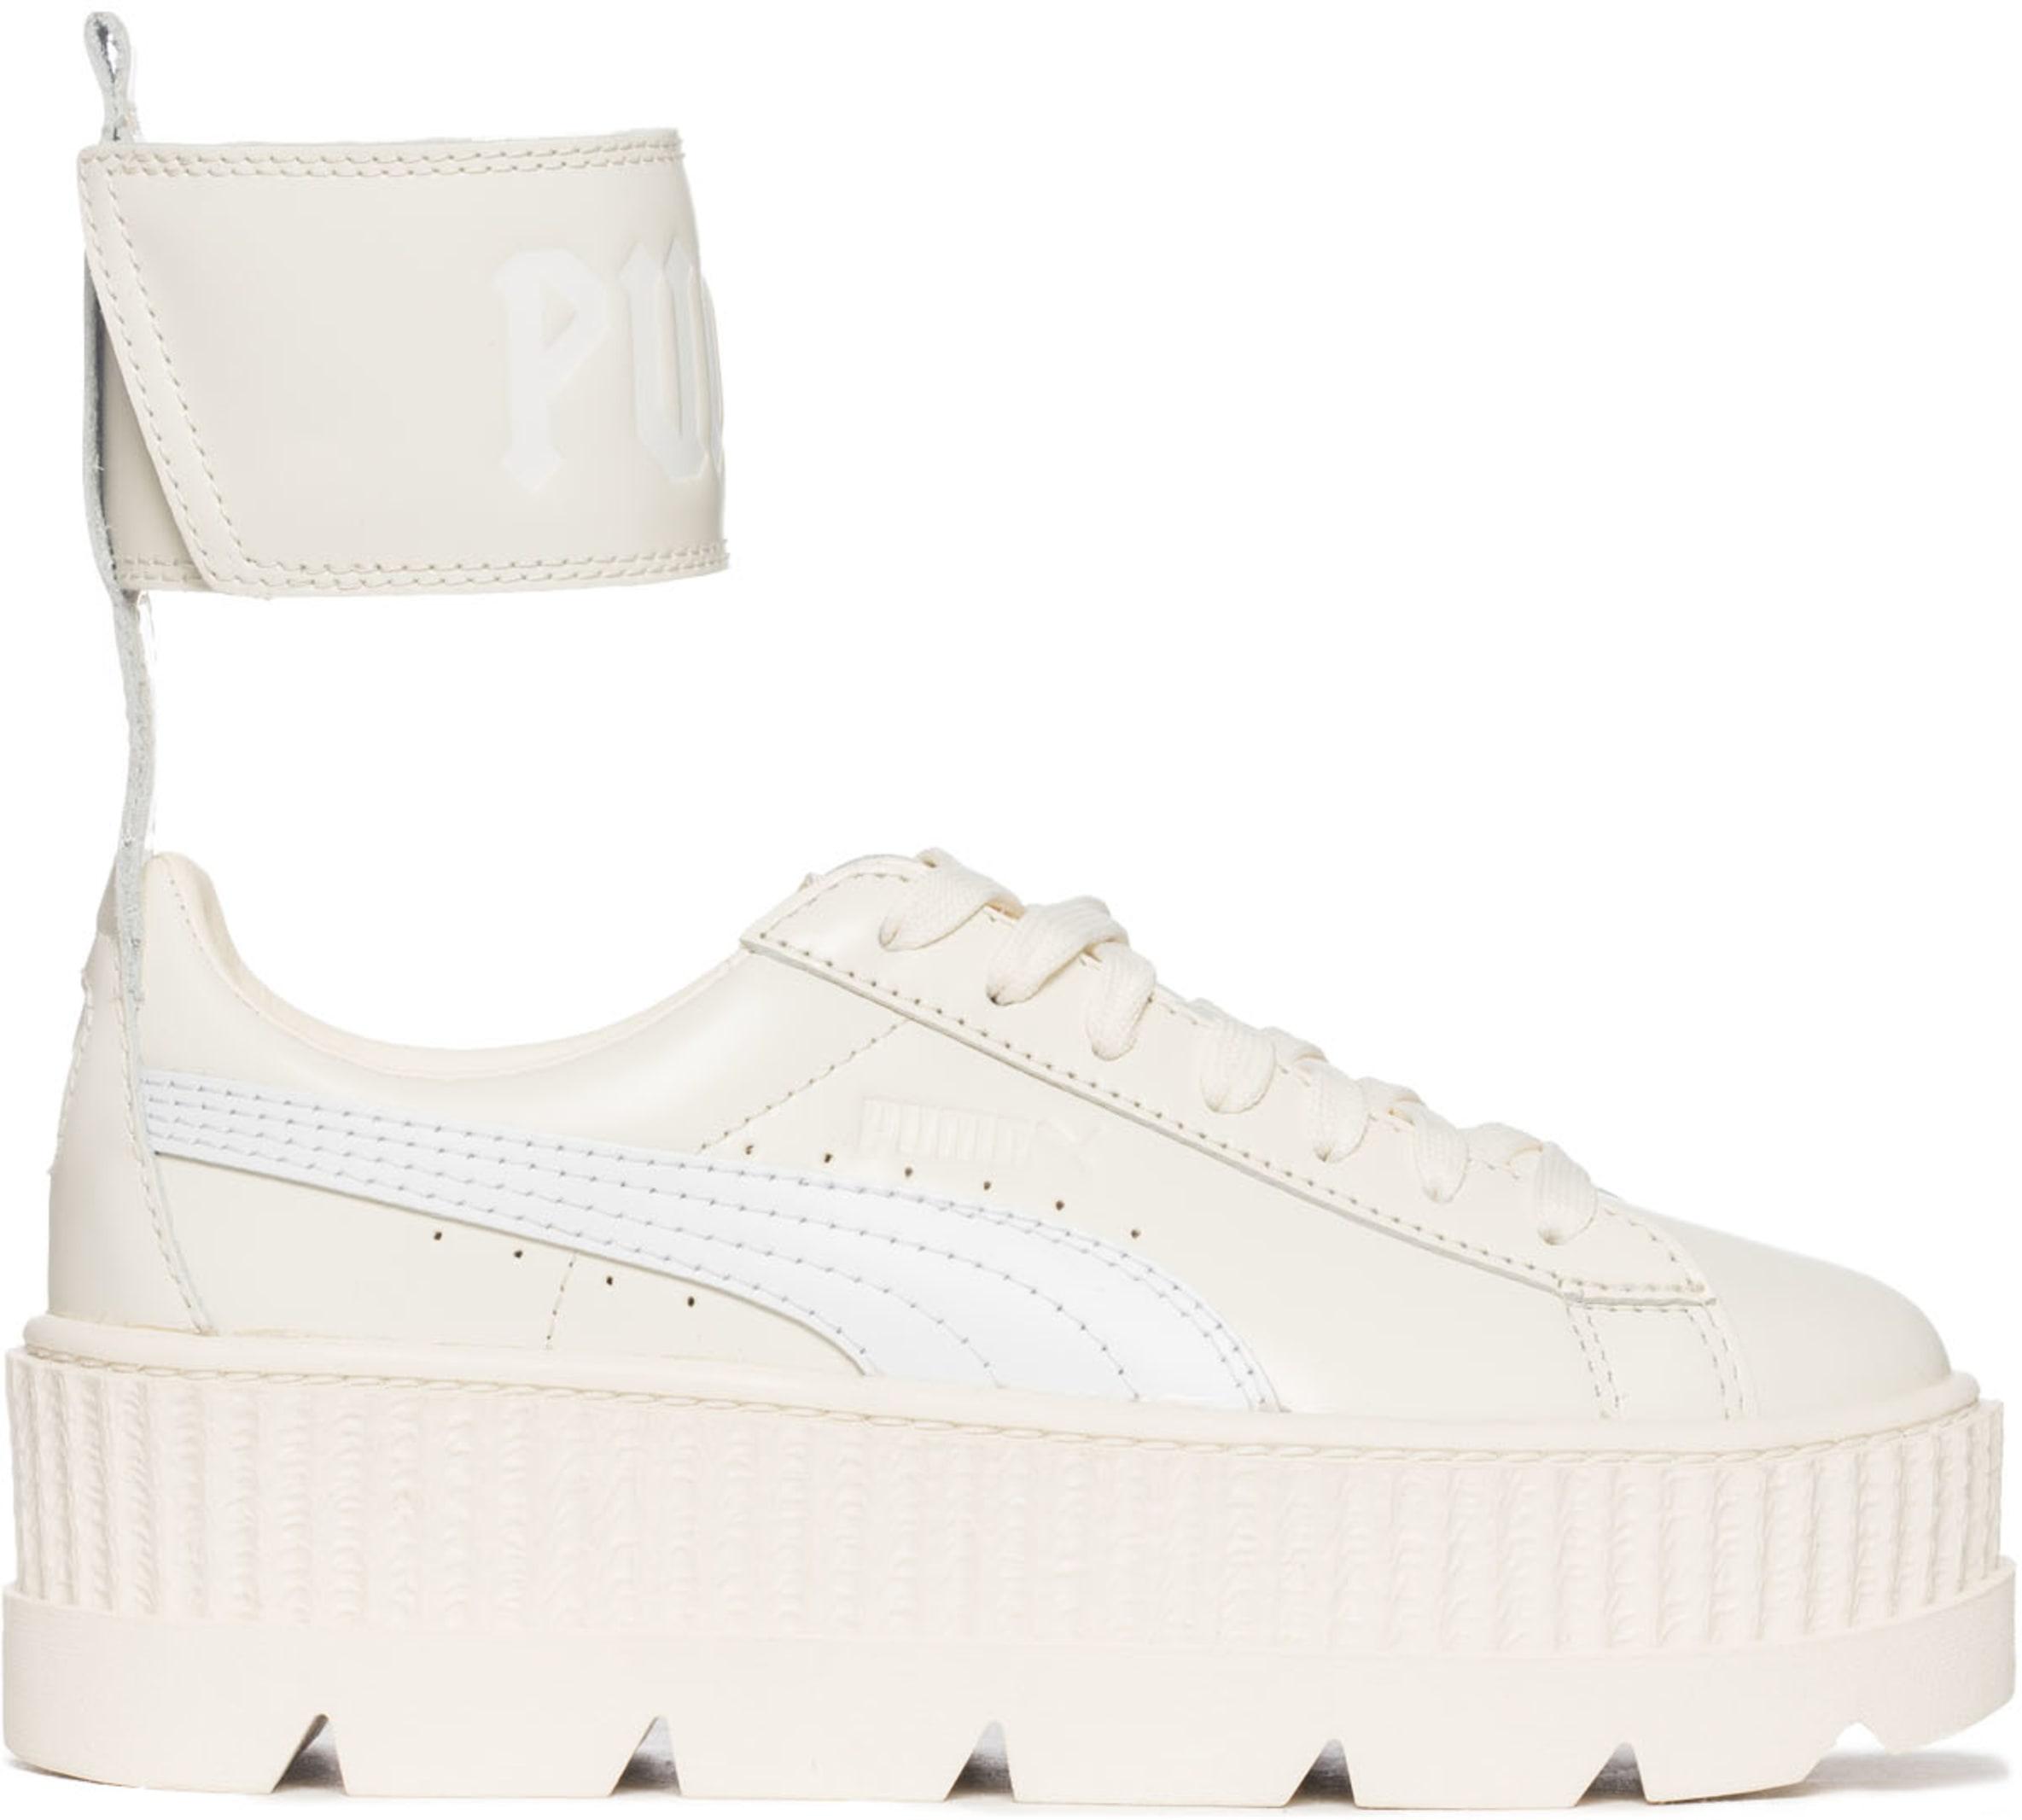 huge discount 682a2 10f9c Puma - Fenty Ankle Strap Creeper - Vanilla Ice/White